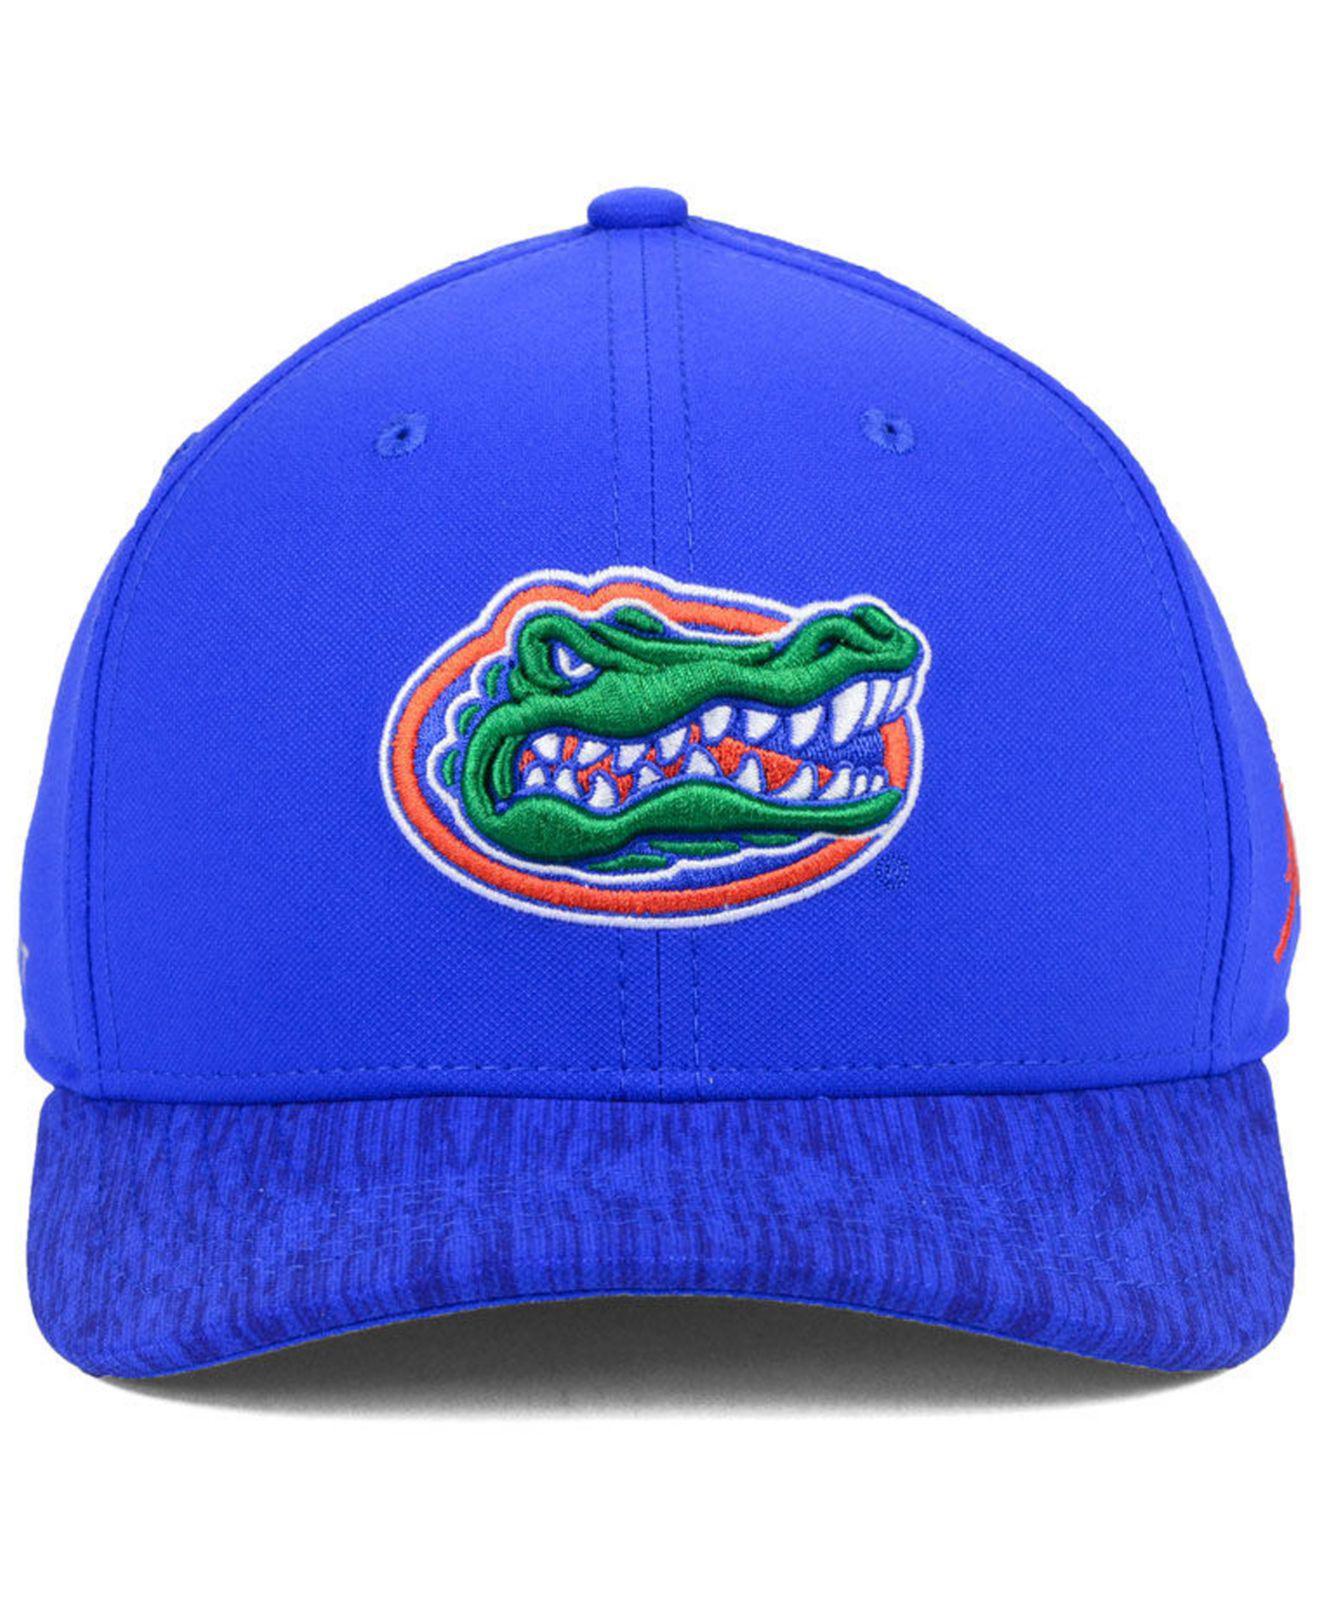 ... purchase lyst nike florida gators arobill swoosh flex cap in blue for  men 196b4 8e9de 4e6bfffcad69